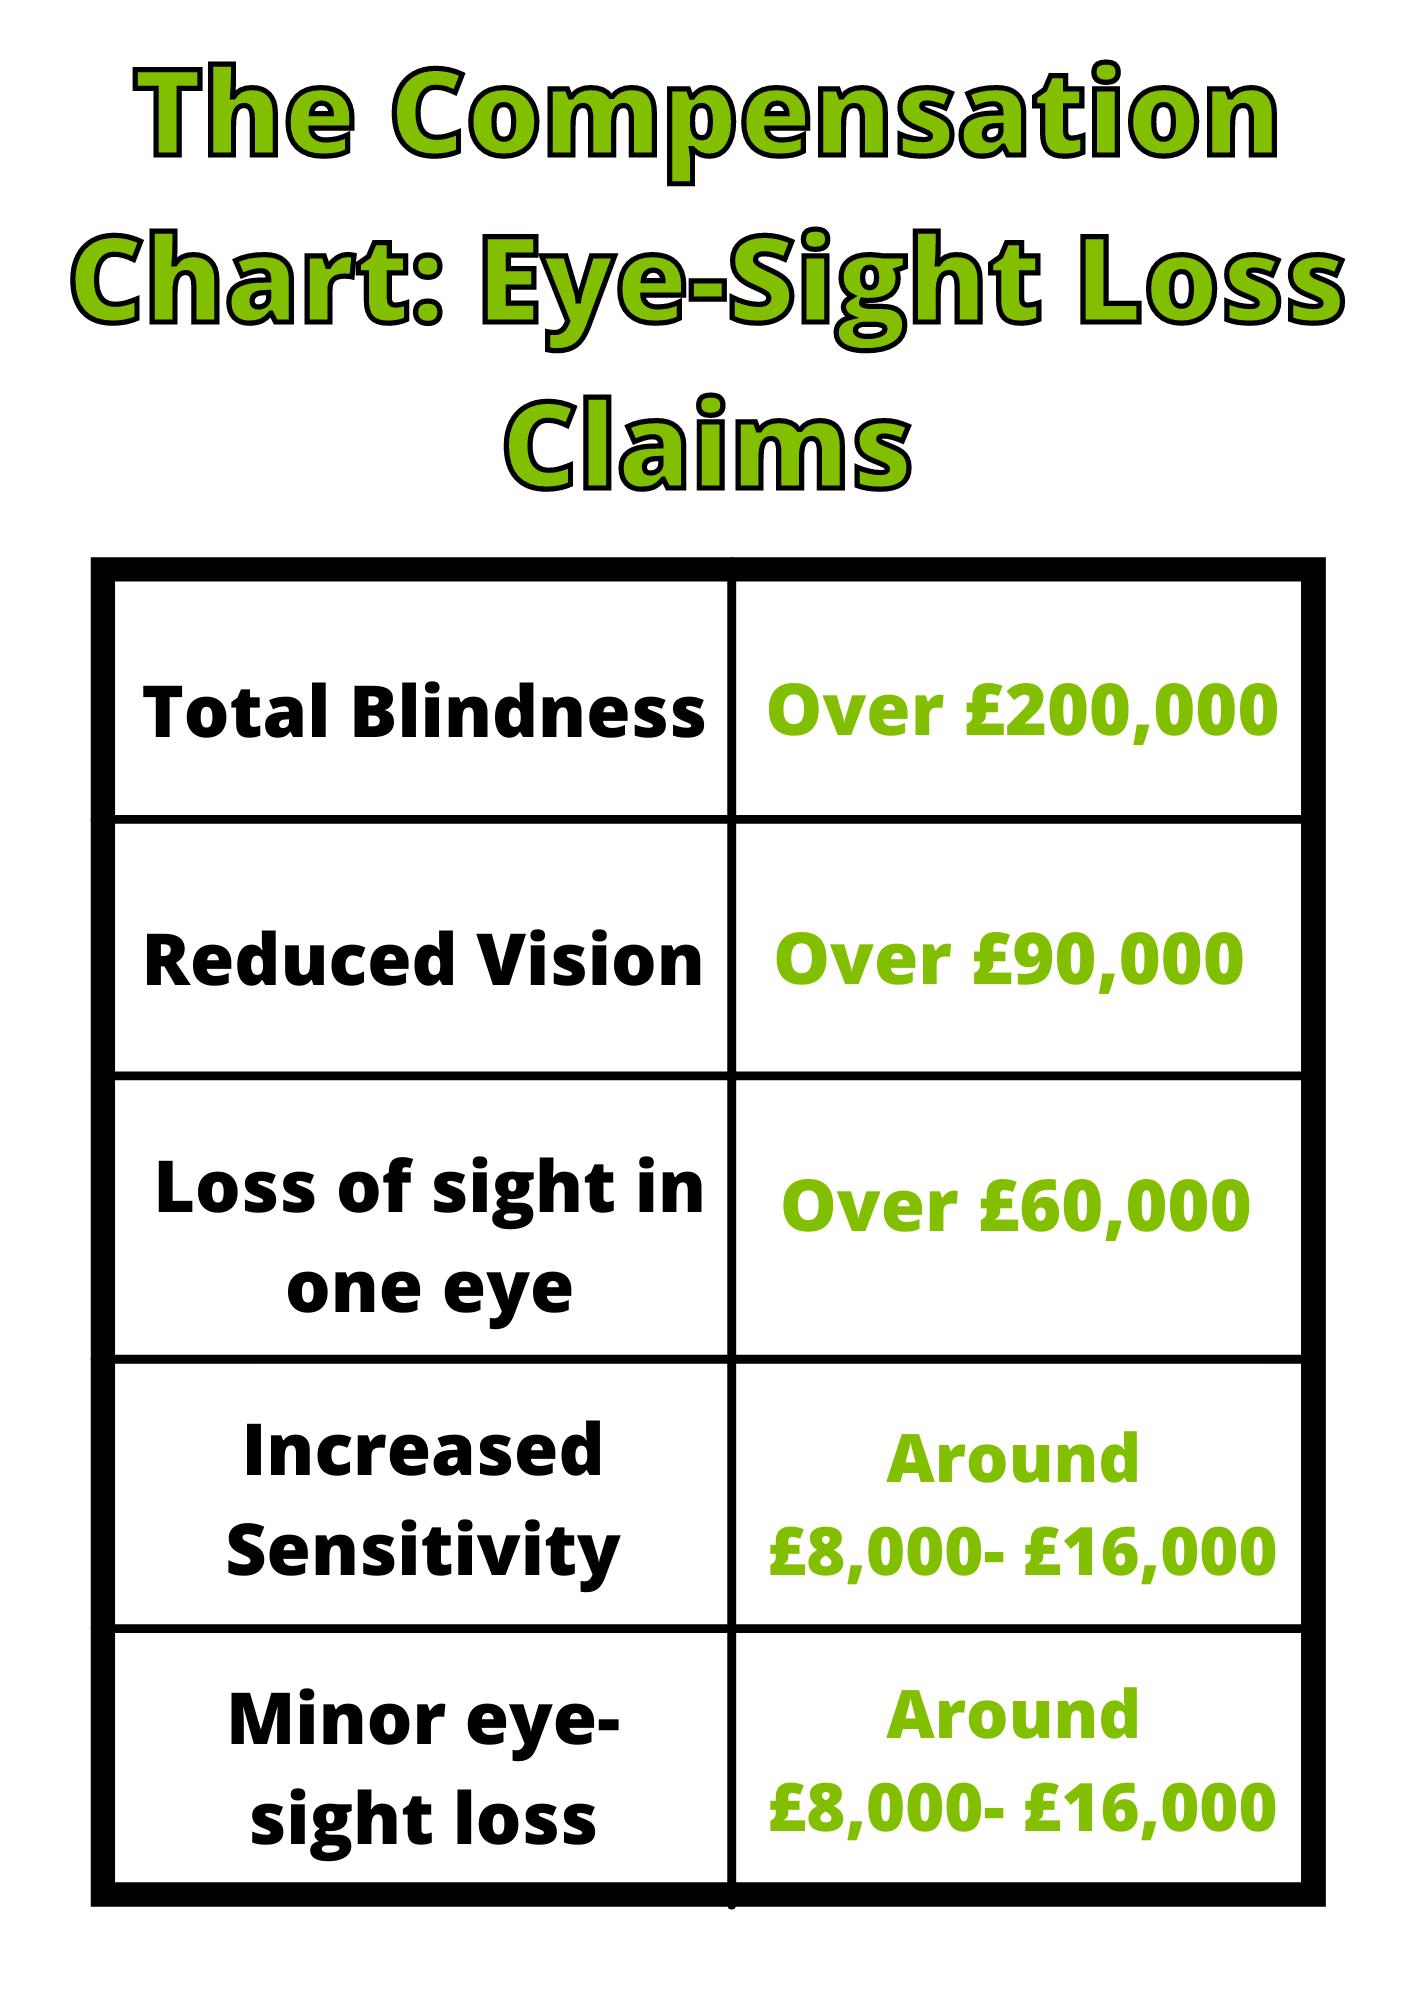 Eye sight loss claims table